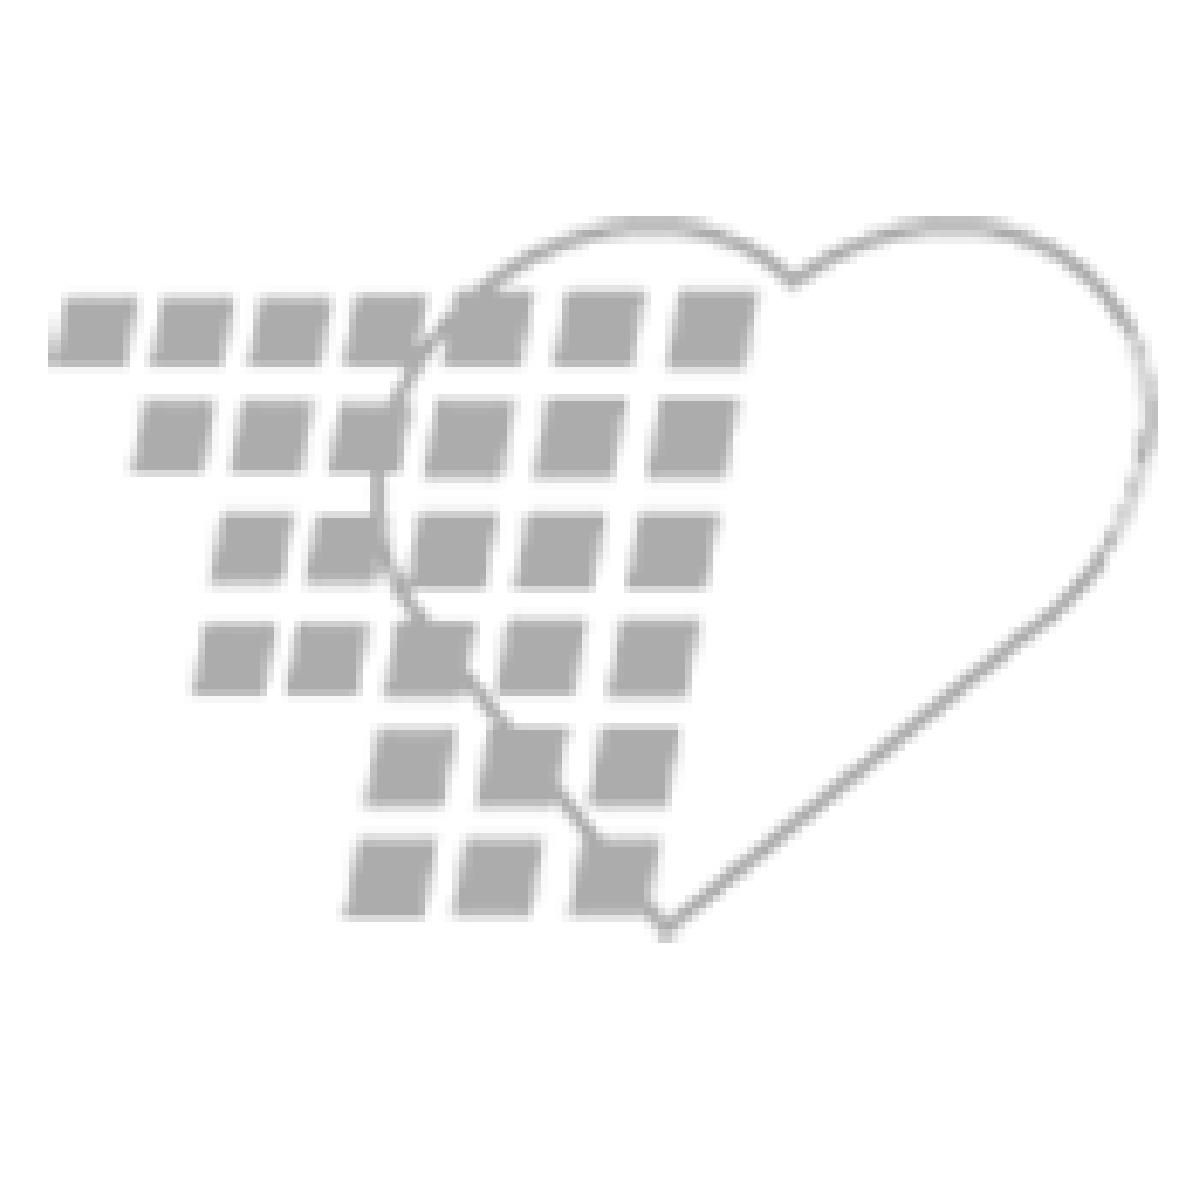 11-81-1069 Nasco Life/form® Cervical Dilatation and Effacement Simulators